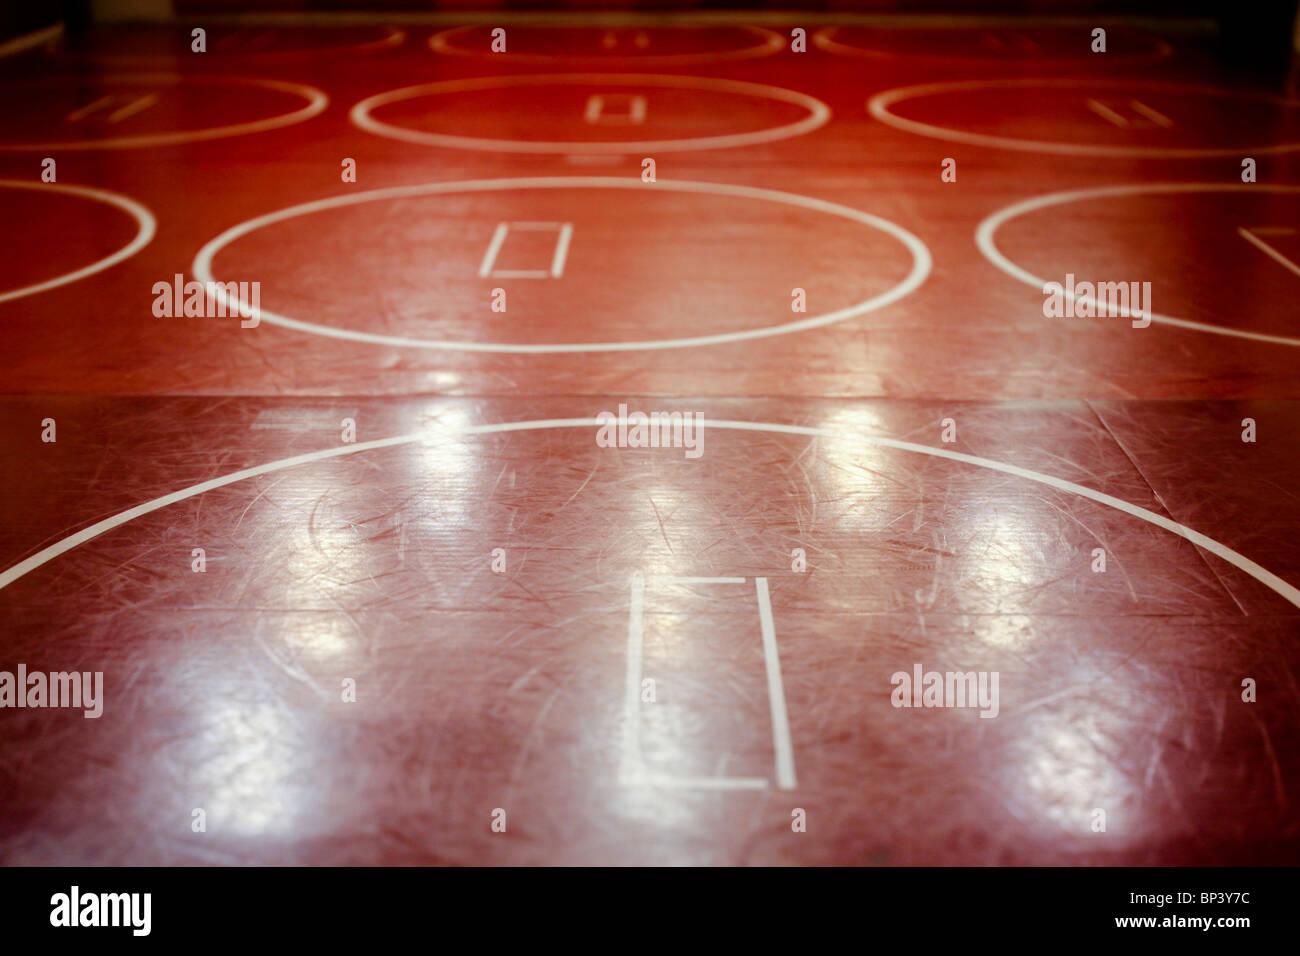 Ben indossati rosso wrestling scolastico mat in una palestra. Immagini Stock